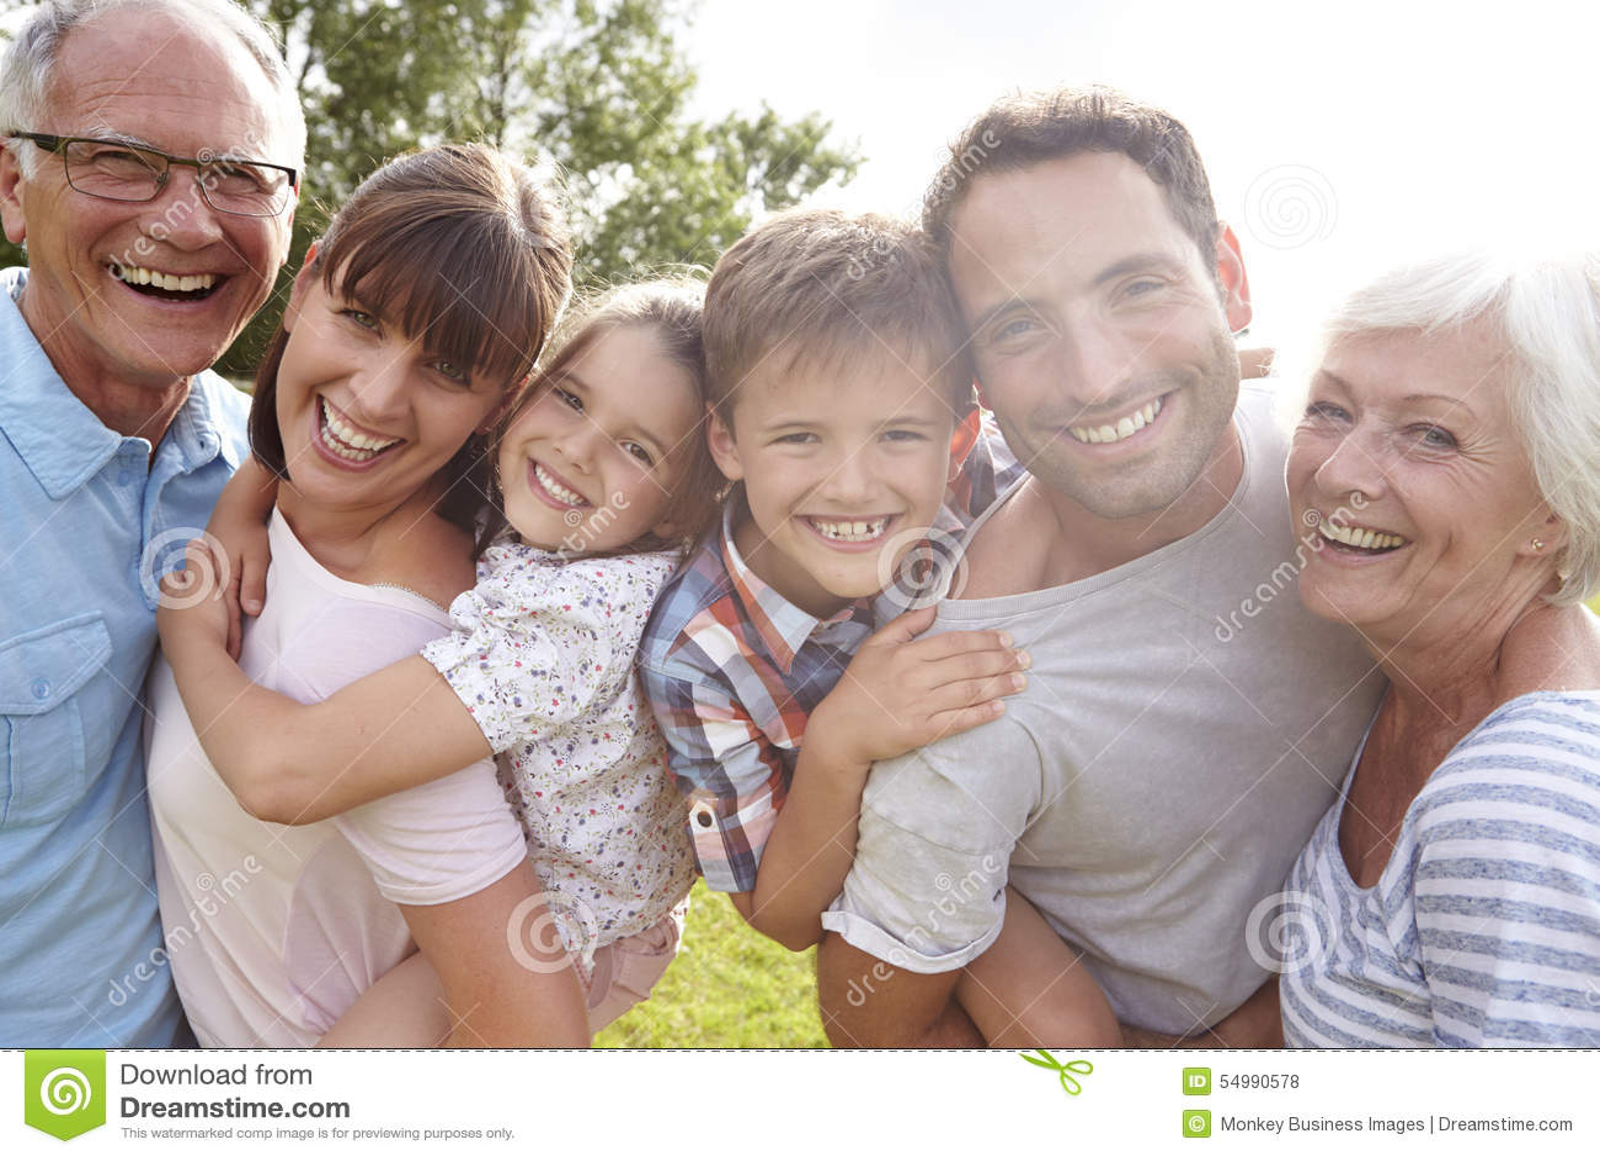 Die multi Generations-Familie, die Kinder gibt, trägt draußen huckepack